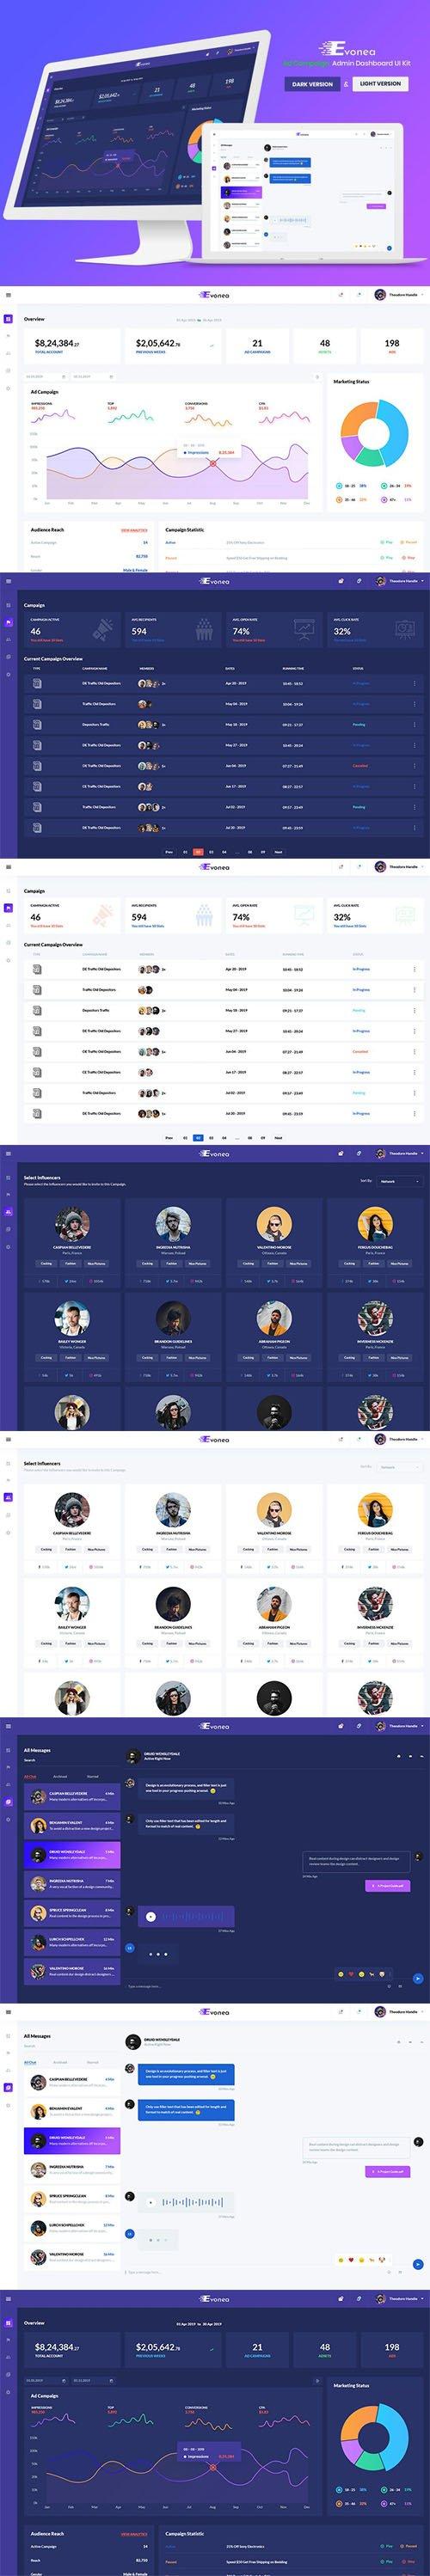 Evonea - Ad Campaign Admin Dashboard UI Kit